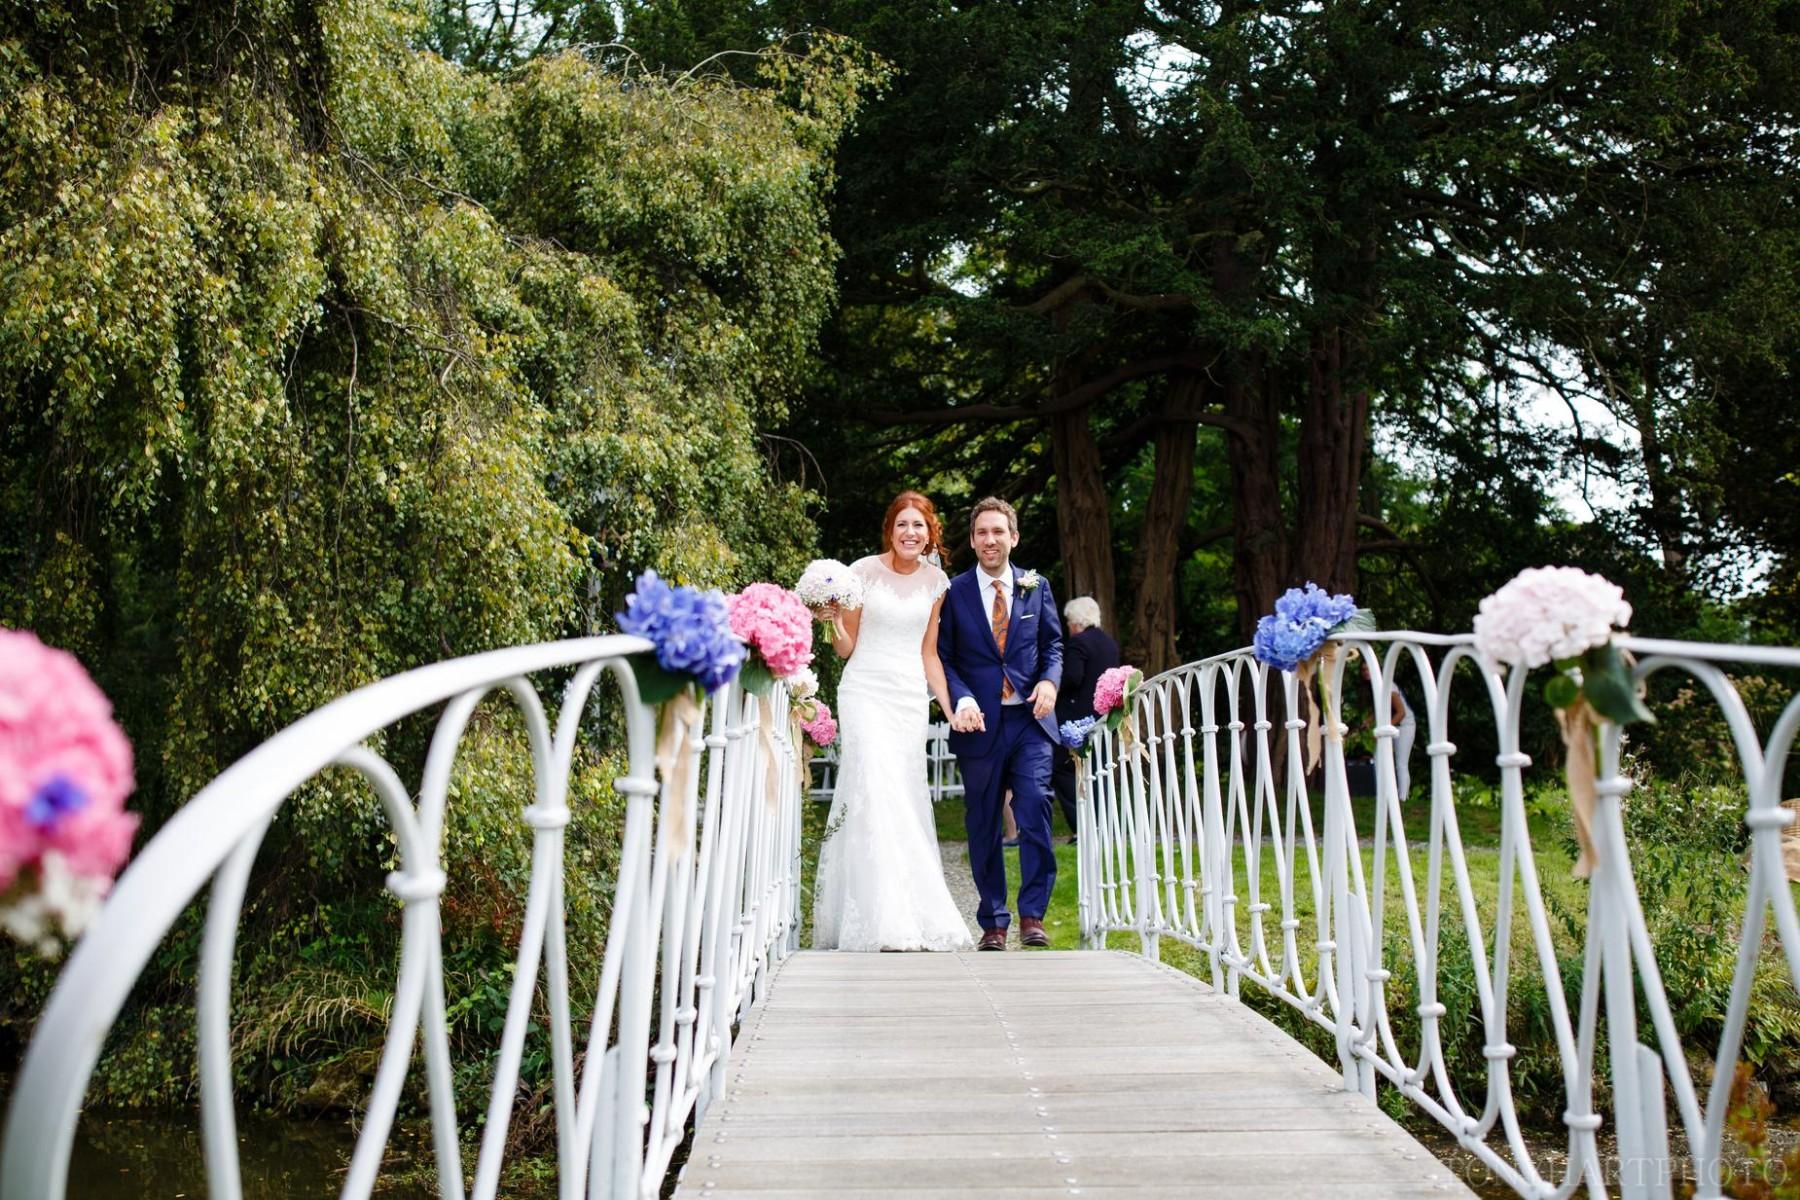 preston_court_wedding_photography_ad-063-1800x1200